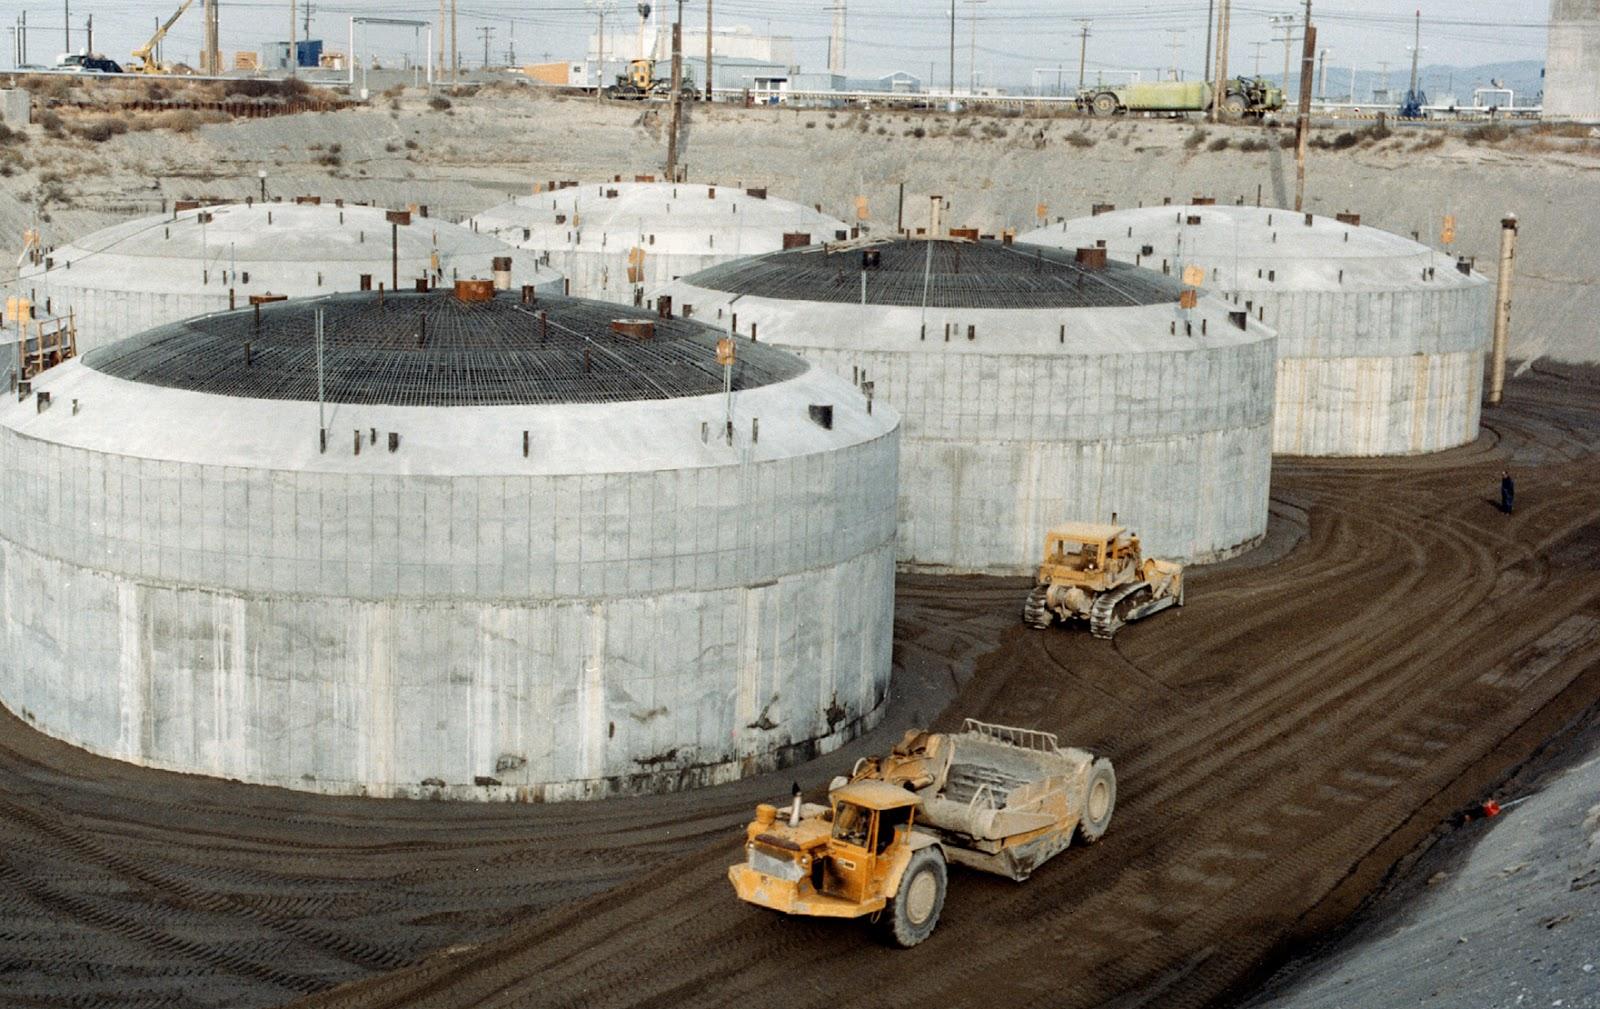 4_tank_wrapped in concrete.jpg